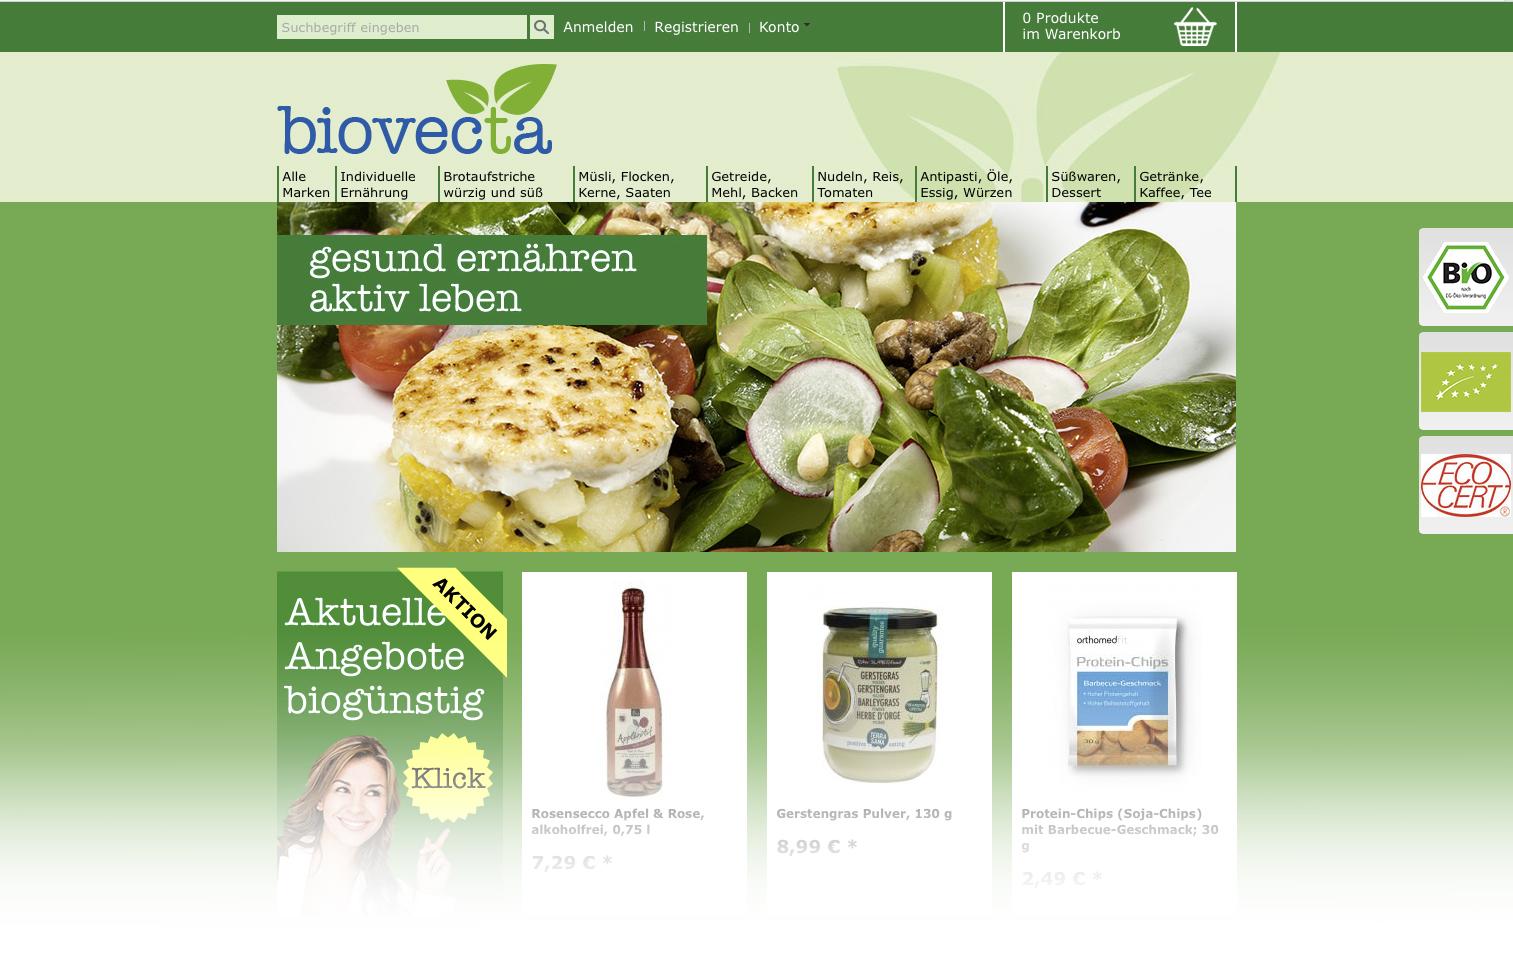 biovektaShop